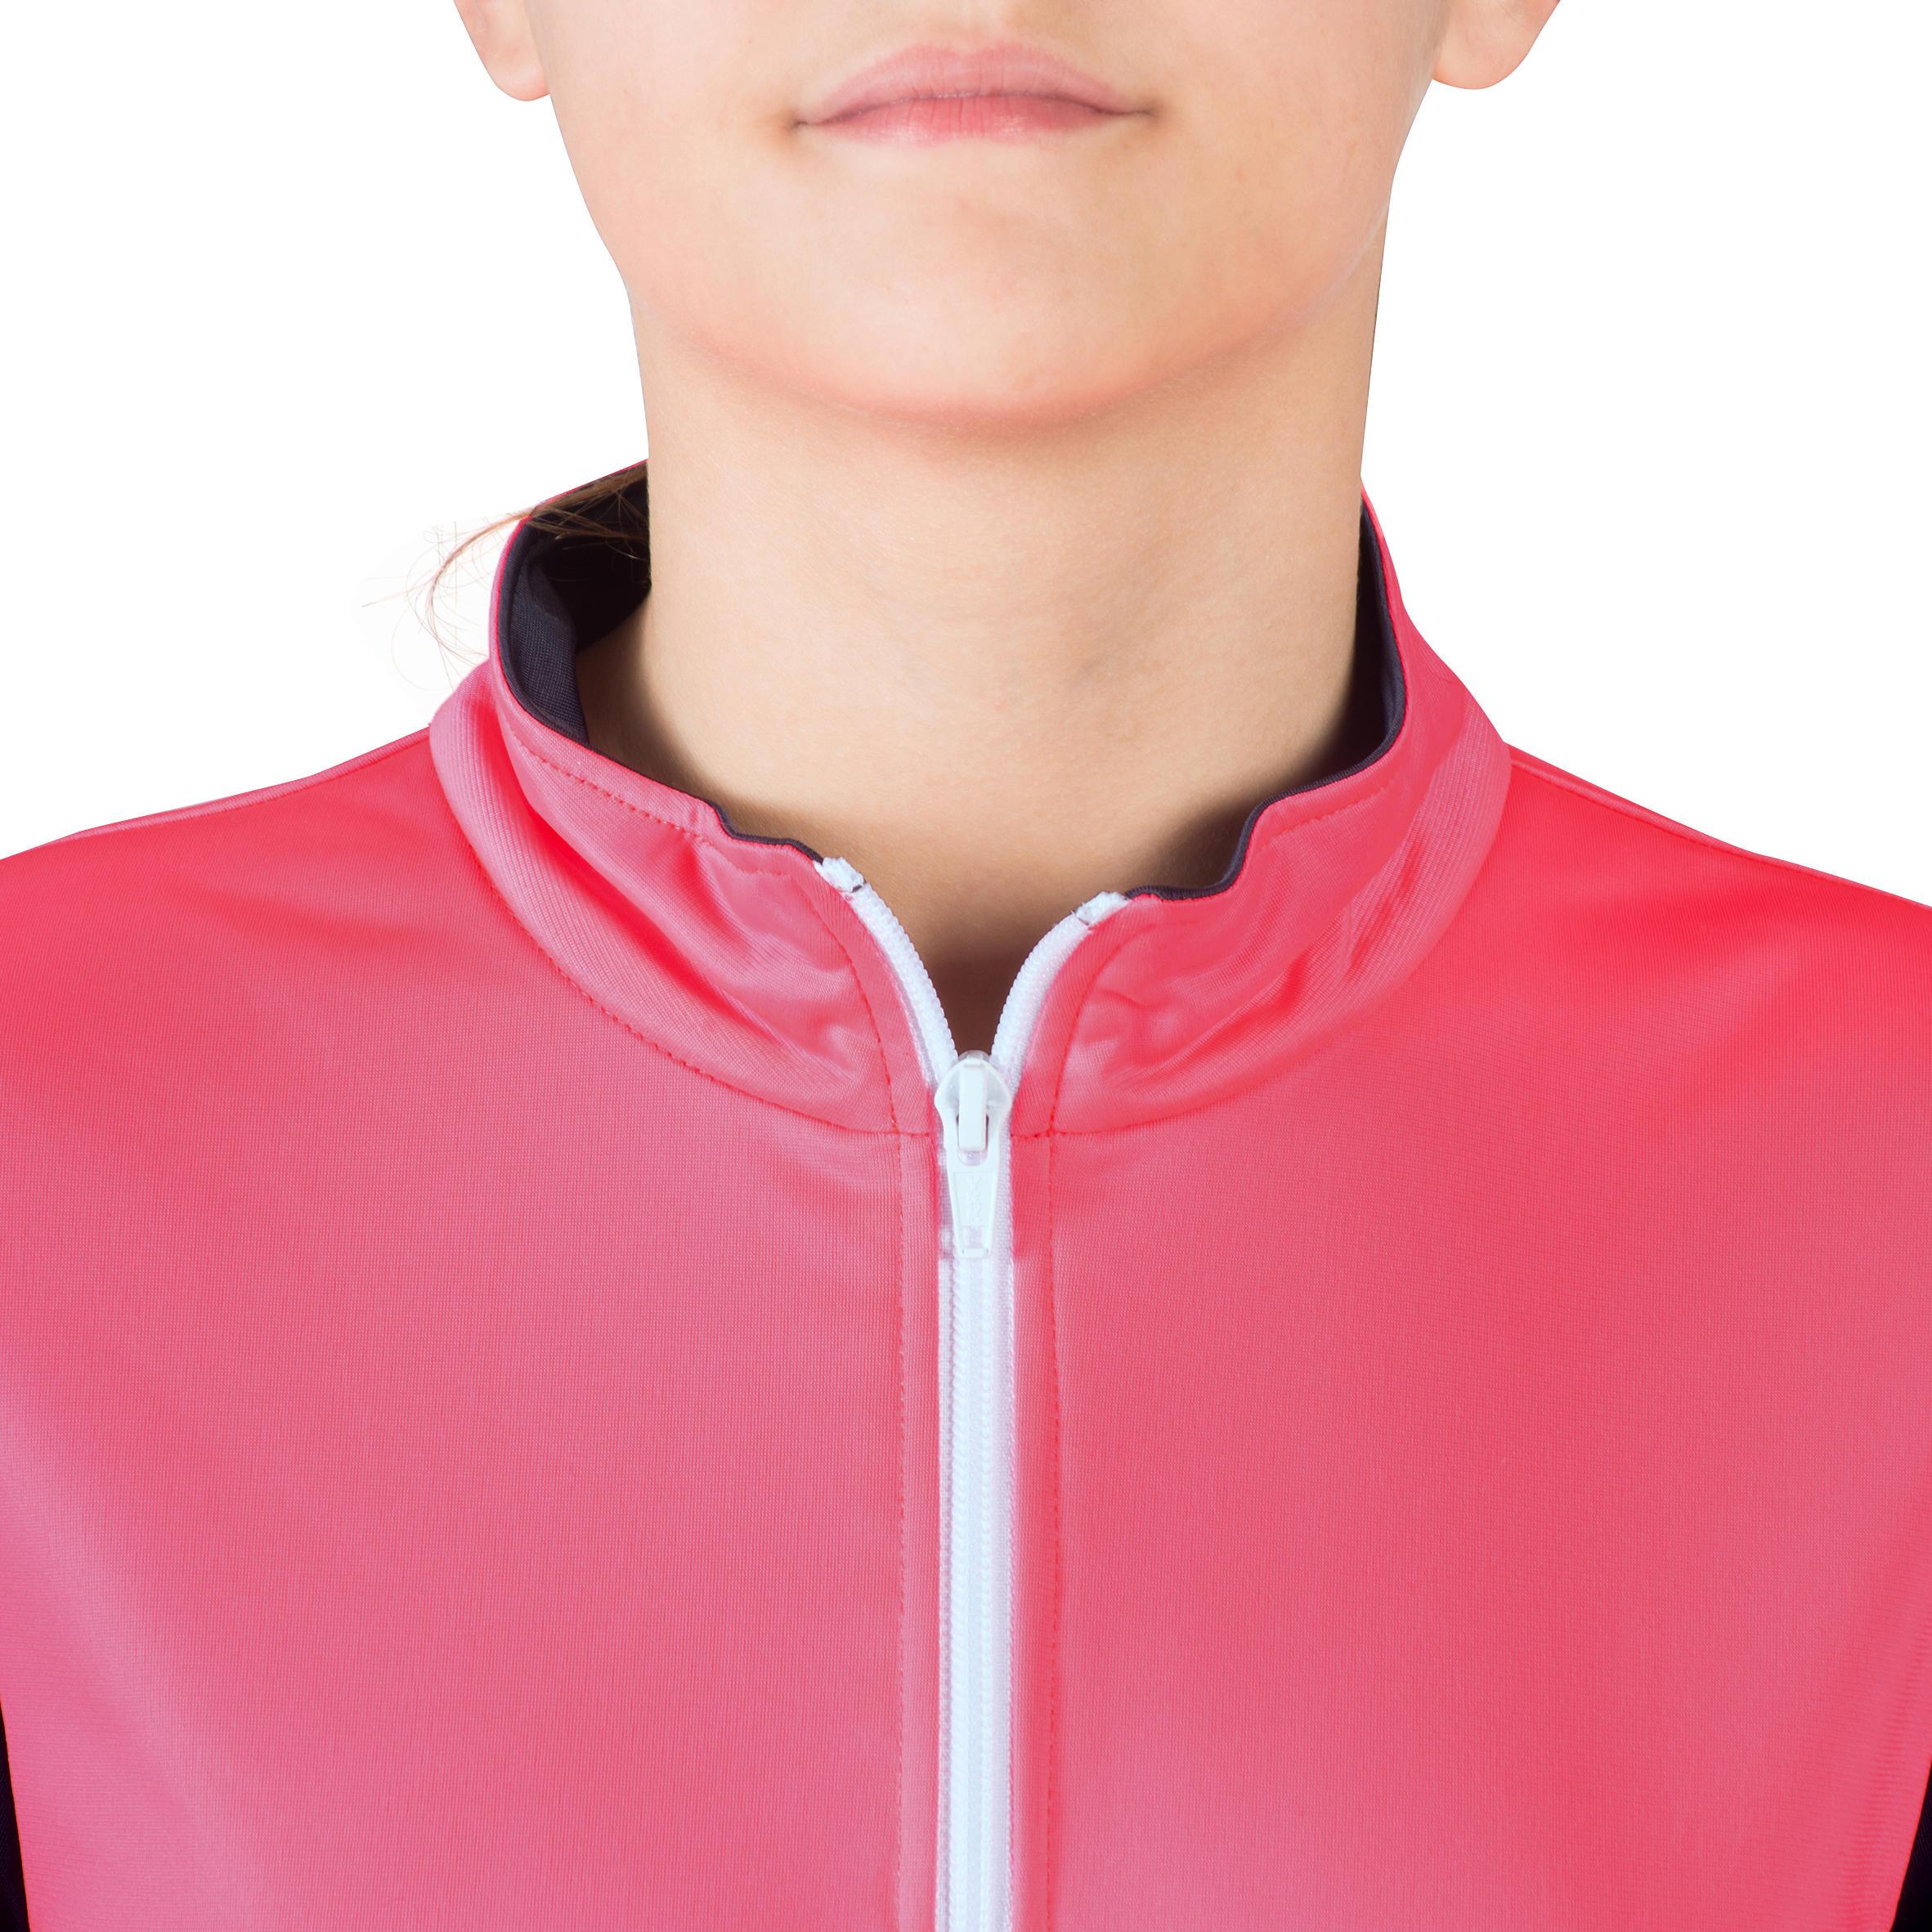 560 Girls' Gym Tracksuit - Pink